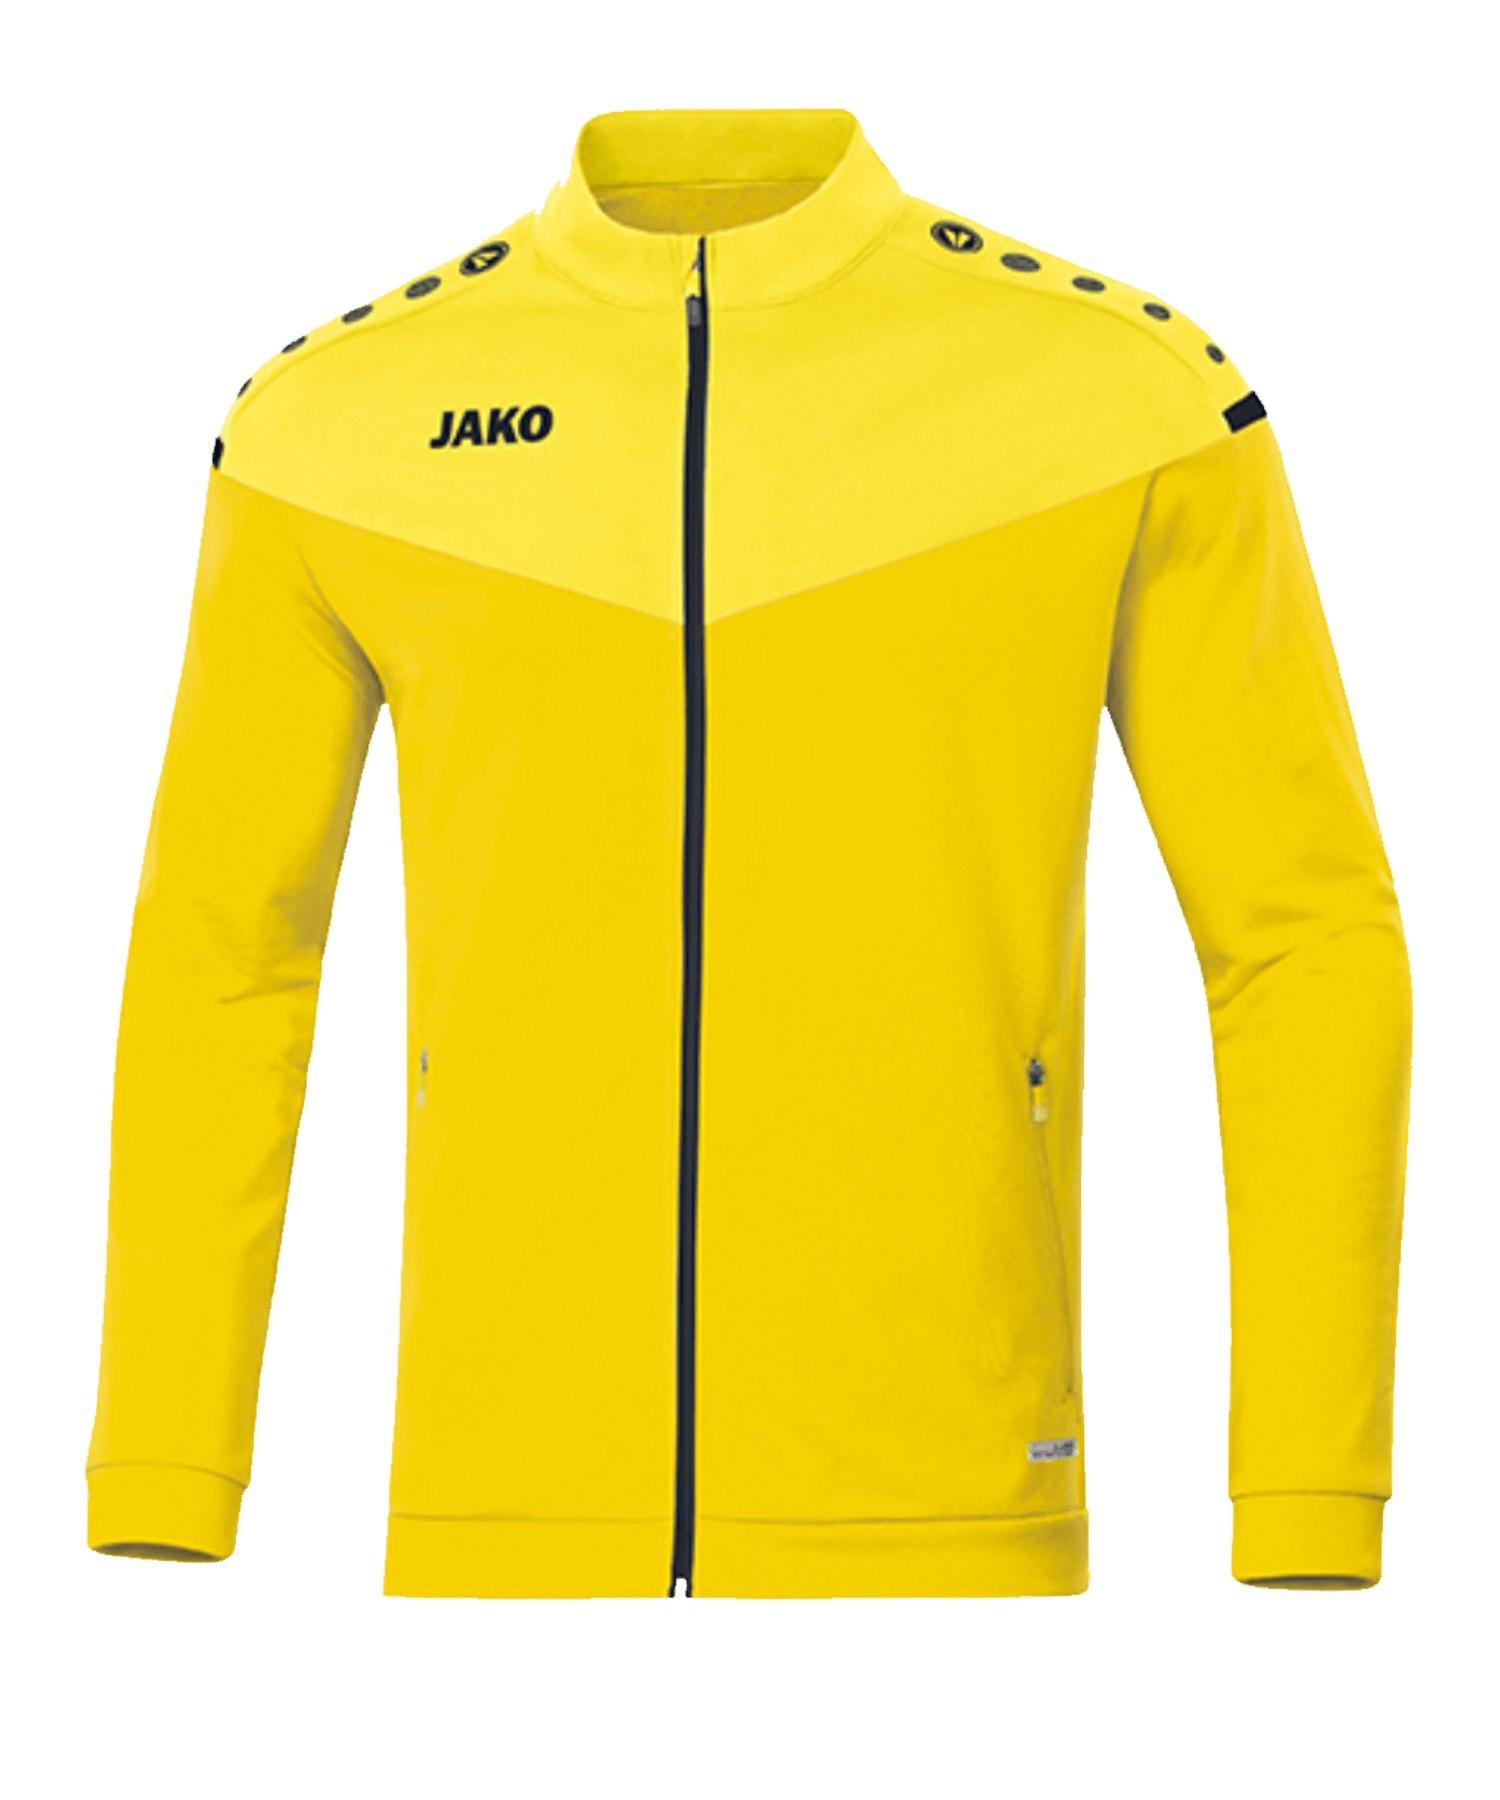 Jako Champ 2.0 Polyesterjacke Gelb F03 - gelb